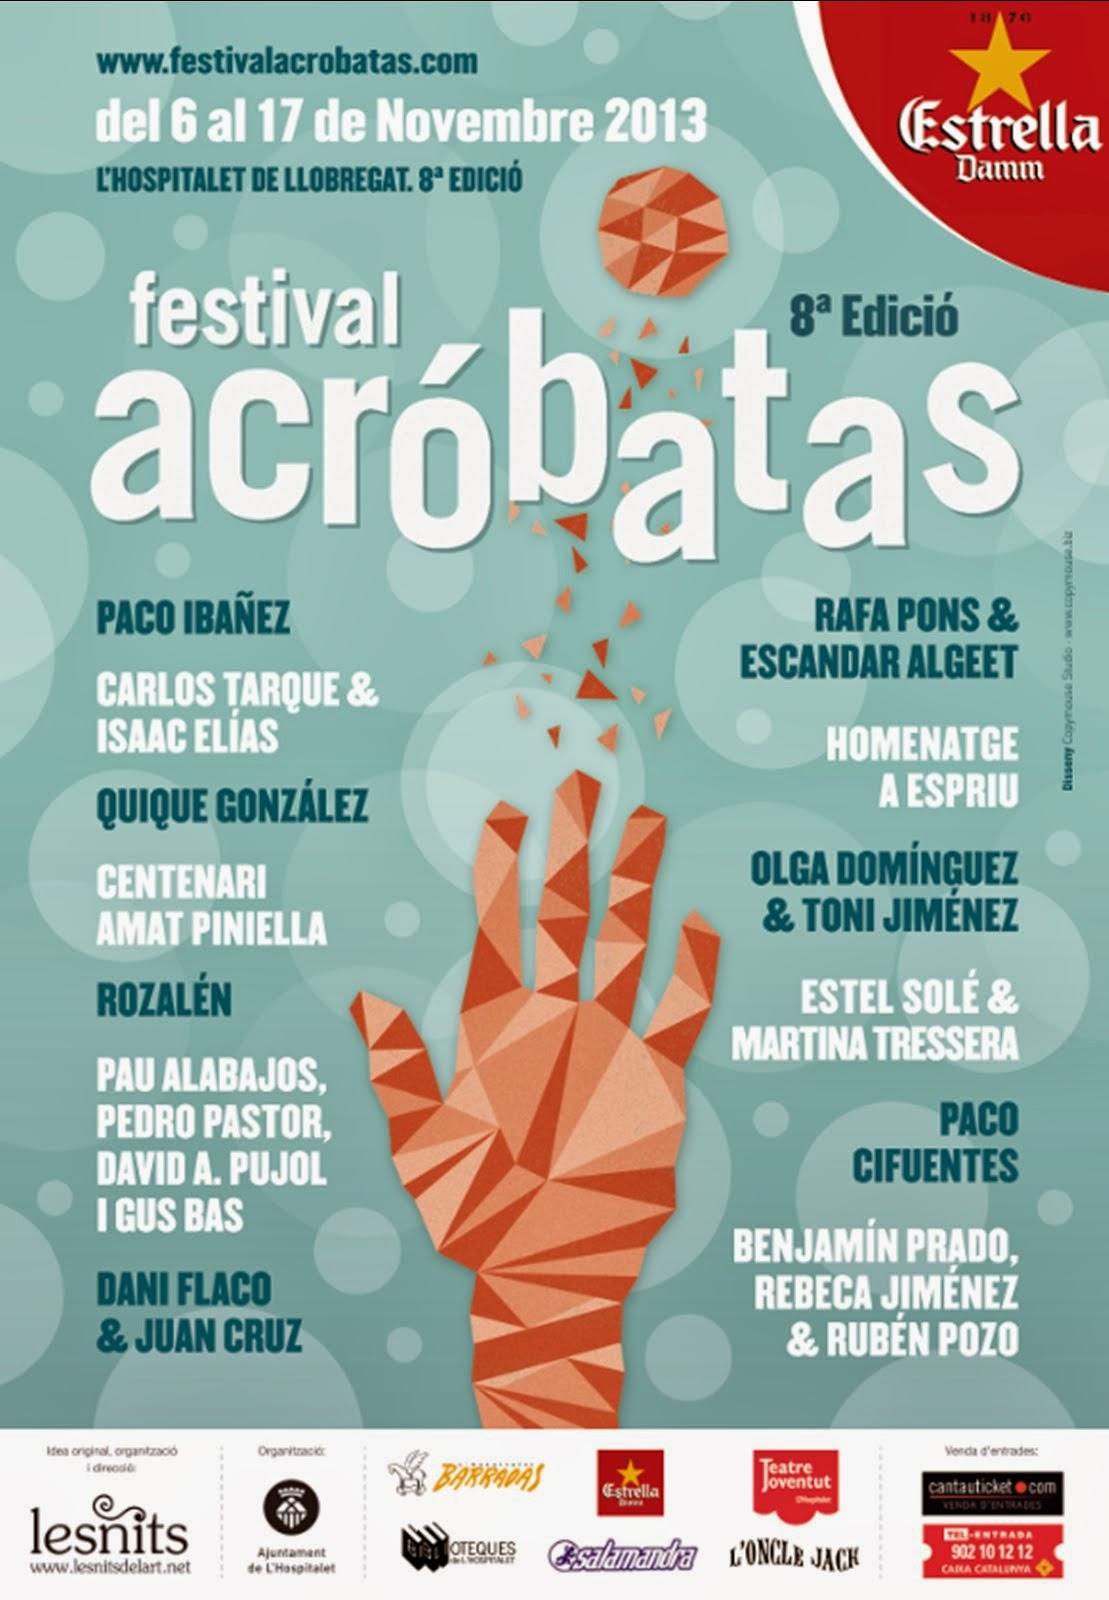 Festival Acróbatas 2013